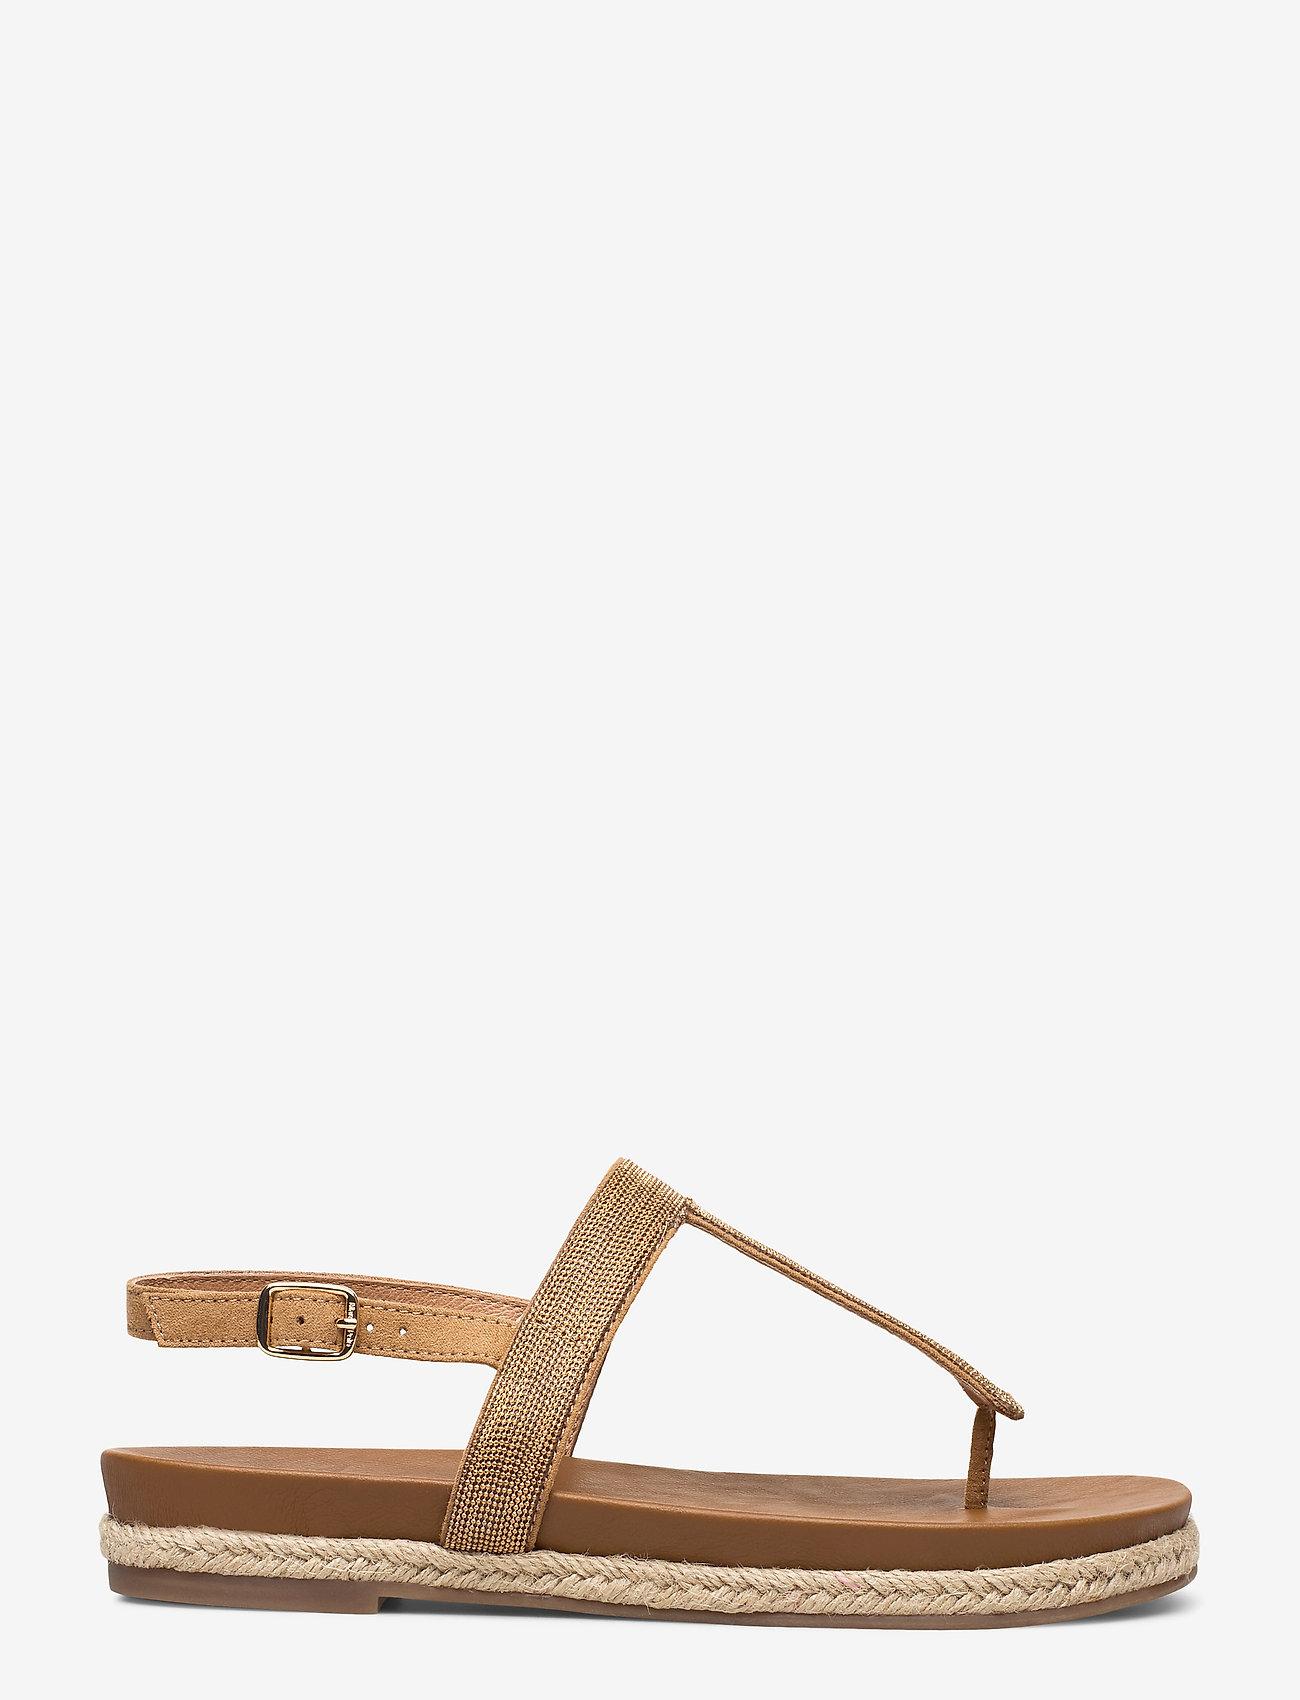 Marc O'Polo Footwear - Sarah 1 - sandales - beige - 1